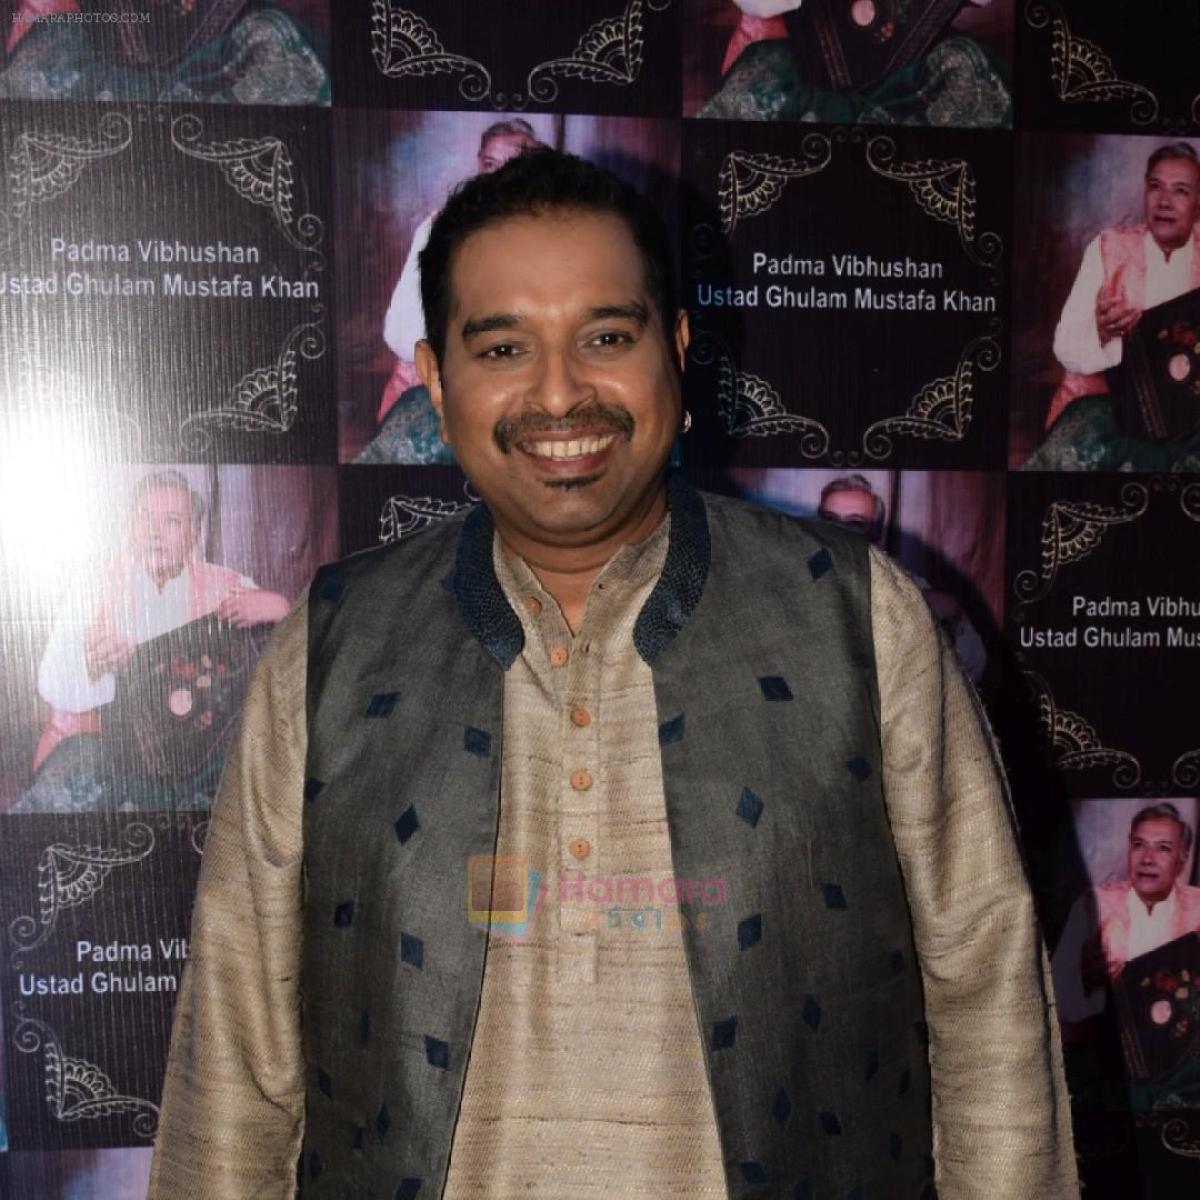 Shankar Mahadevan's 'ode' to para cricketers